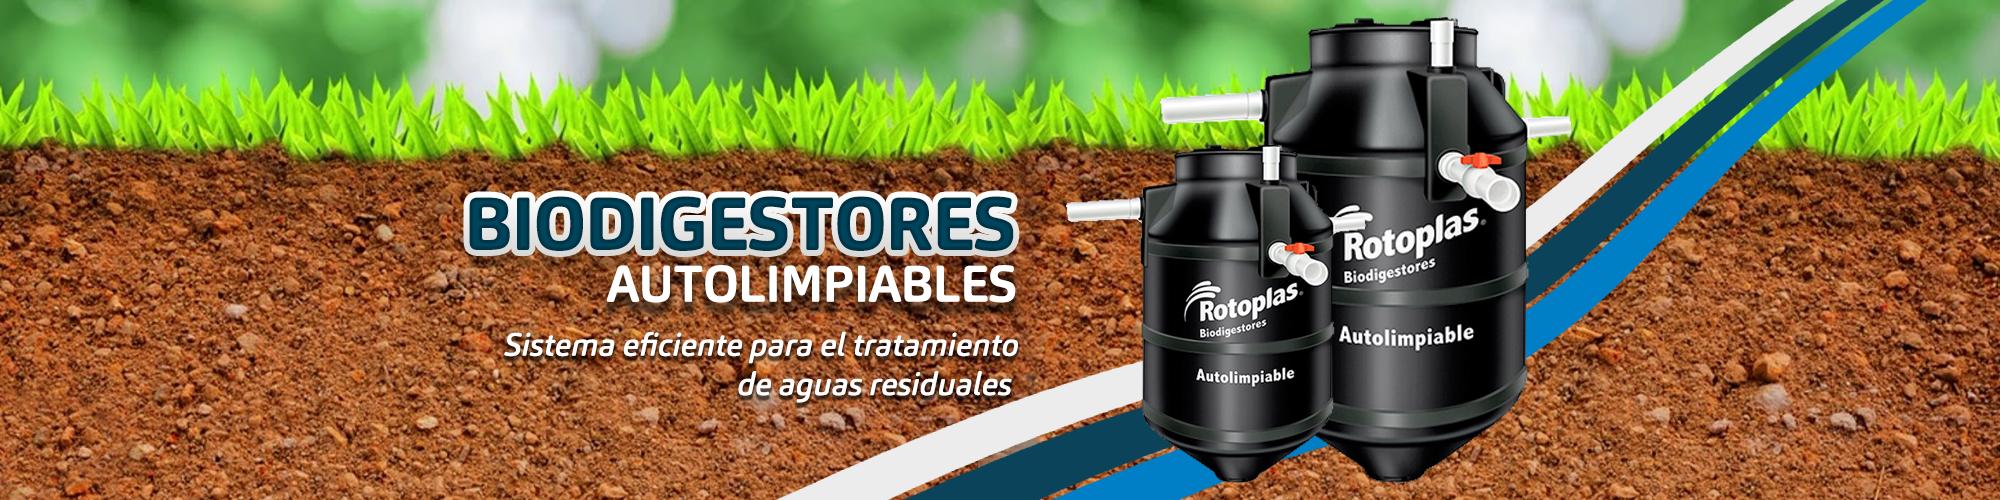 biodigestor-los-hidros-biodigestor-rotoplas-fosa-septica-riobamba-agua-potable-riego-quito-alcantarillado-latacunga